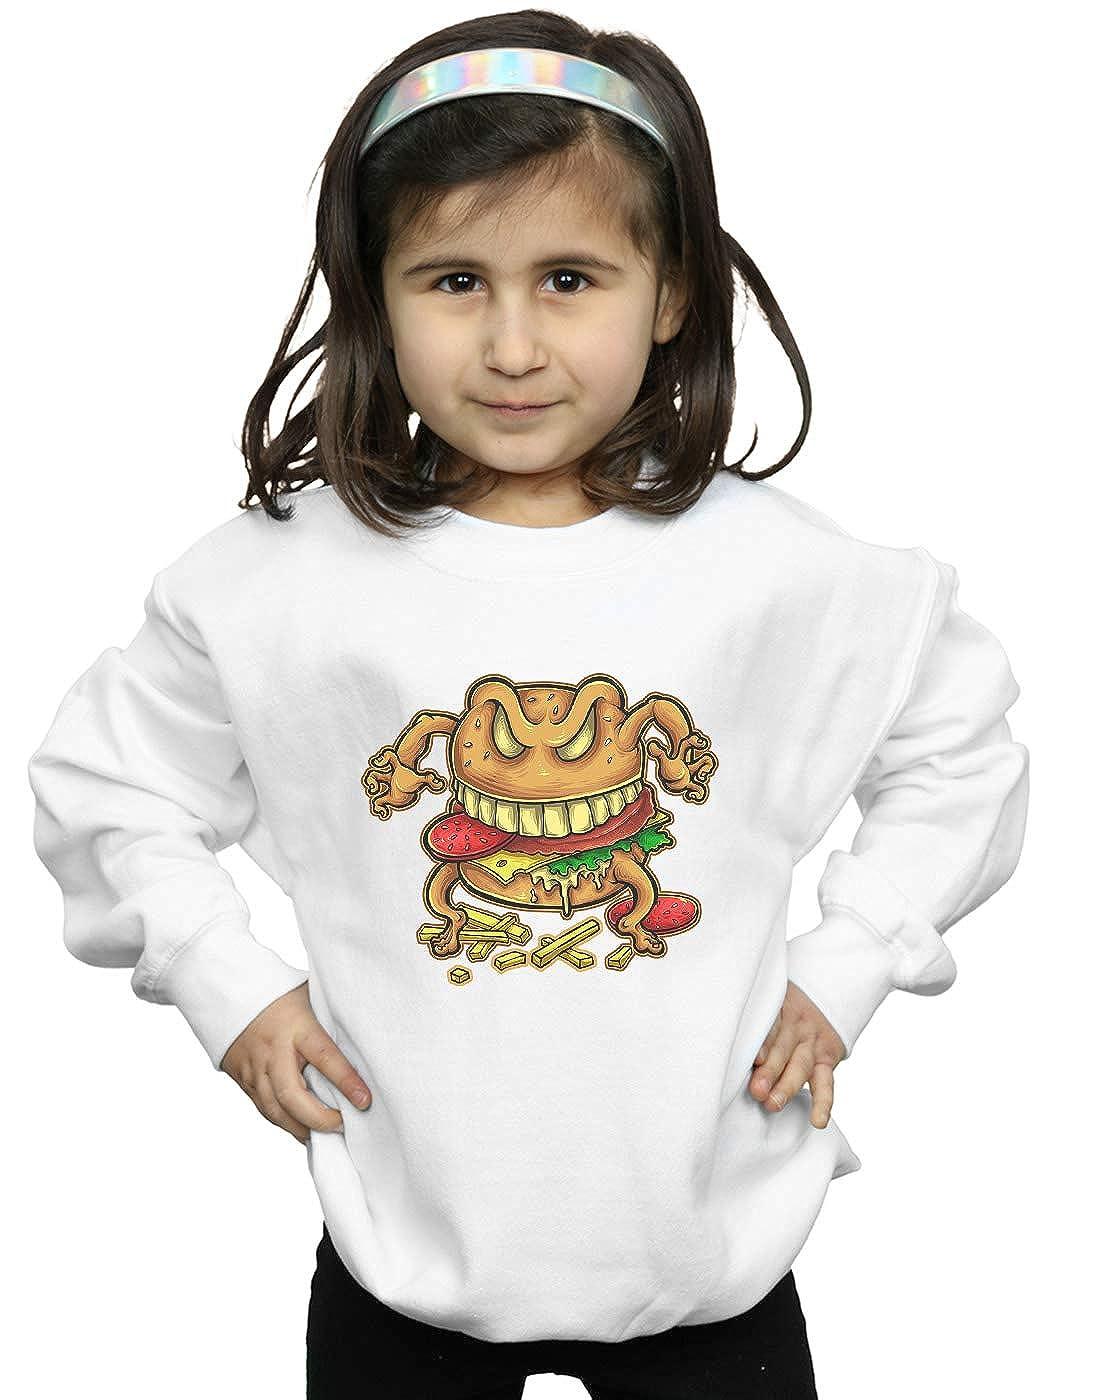 Absolute Cult Drewbacca Girls Curse of The Burger Sweatshirt